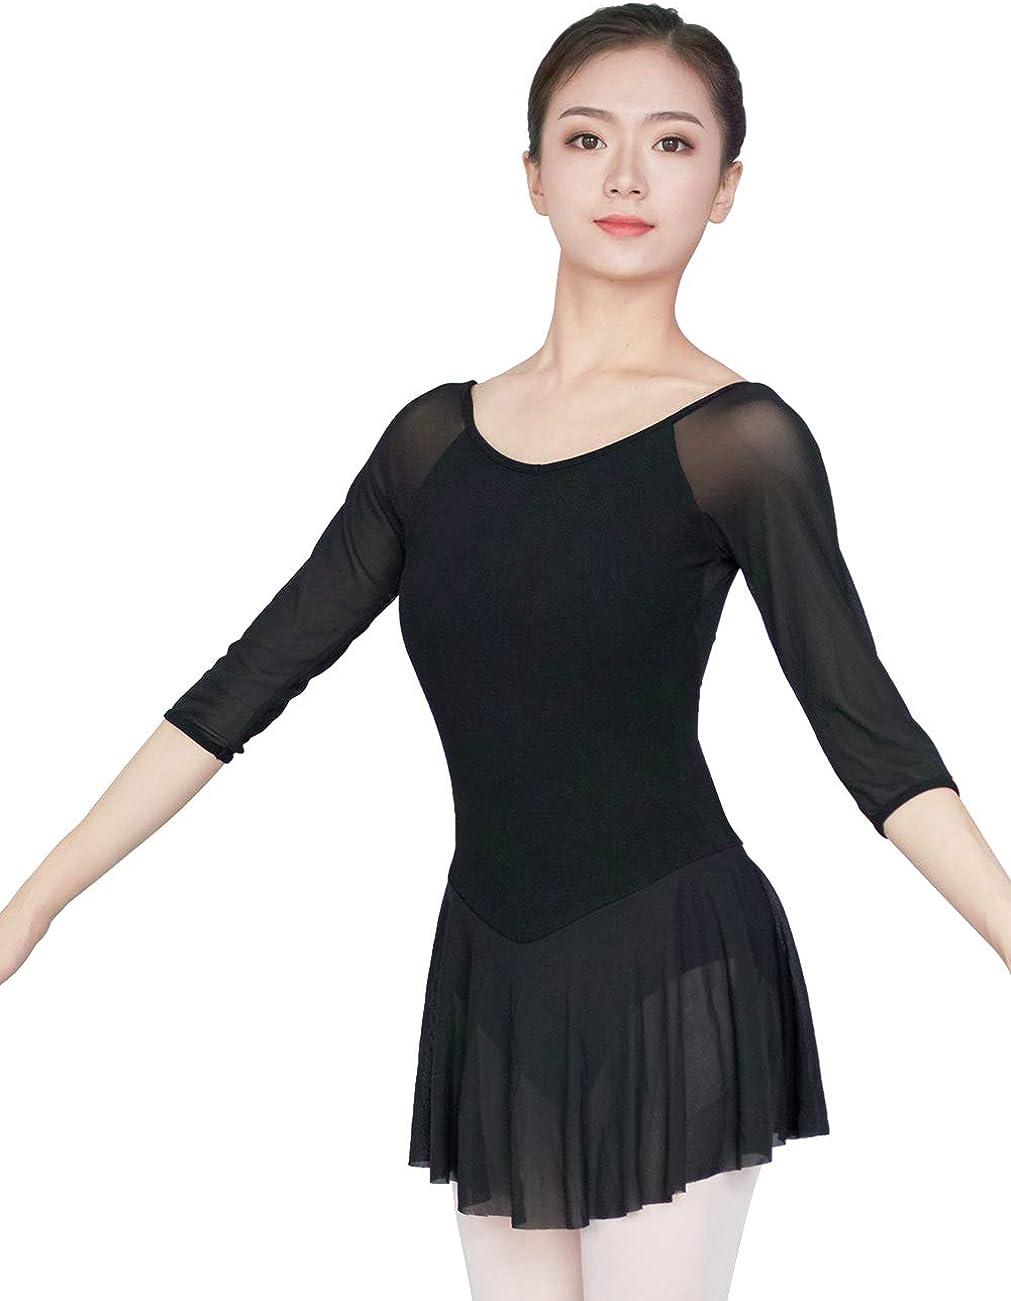 Womens Adult Leotards 3//4 Hollow Sleeve Dance Leotards for Ballet Aerobics